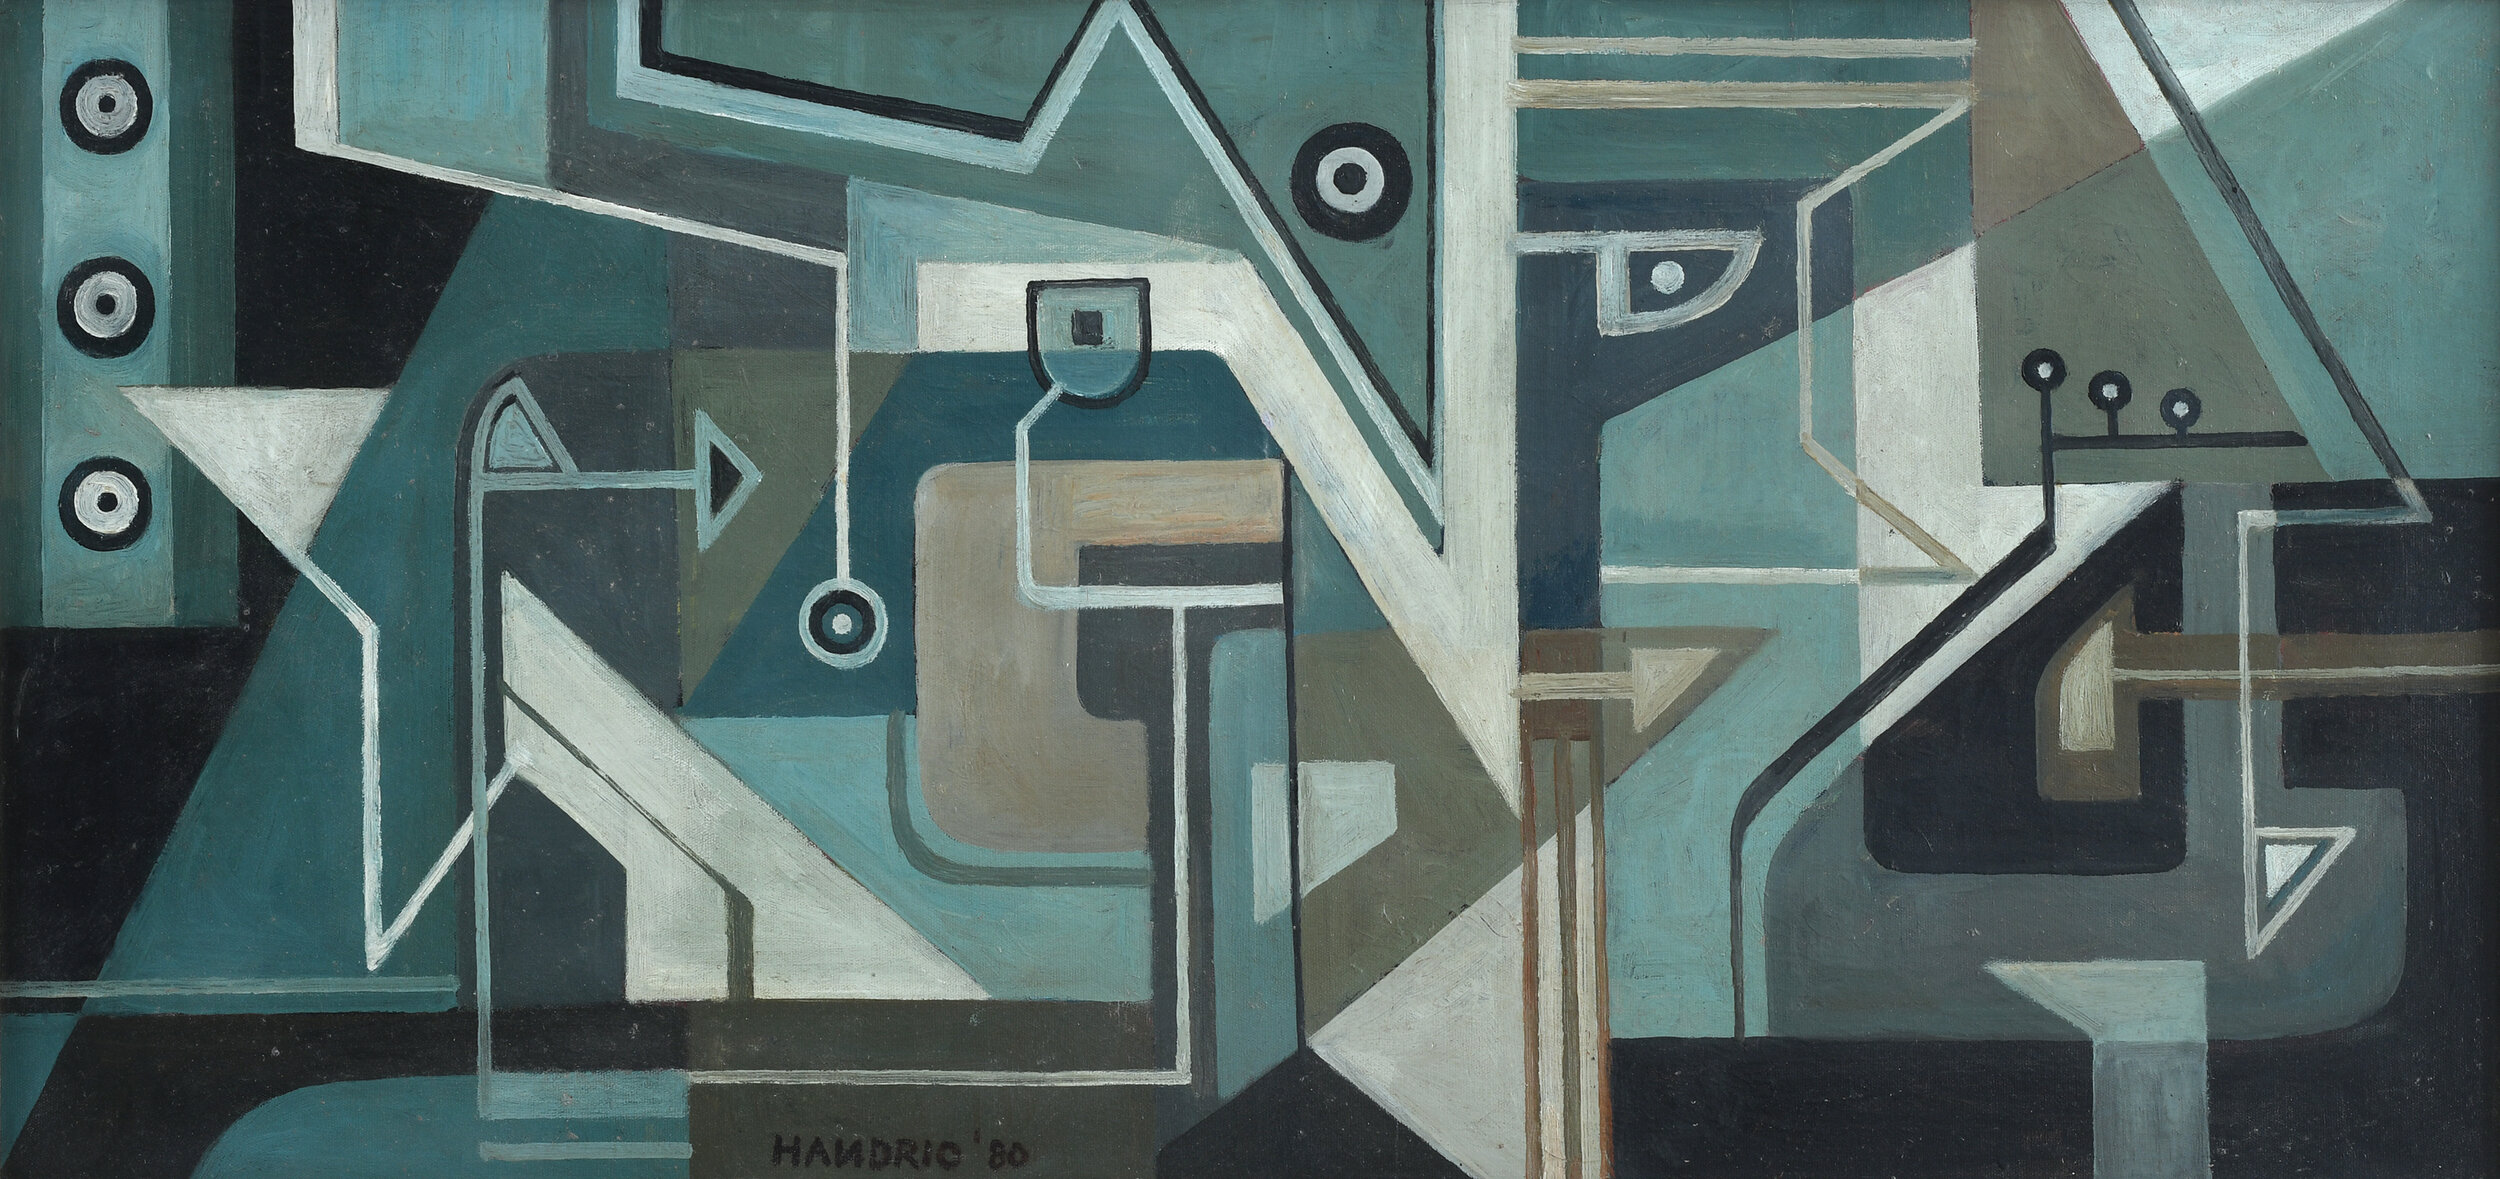 Handrio, Instalasi (Installation), 1980, 45 x 93 cm